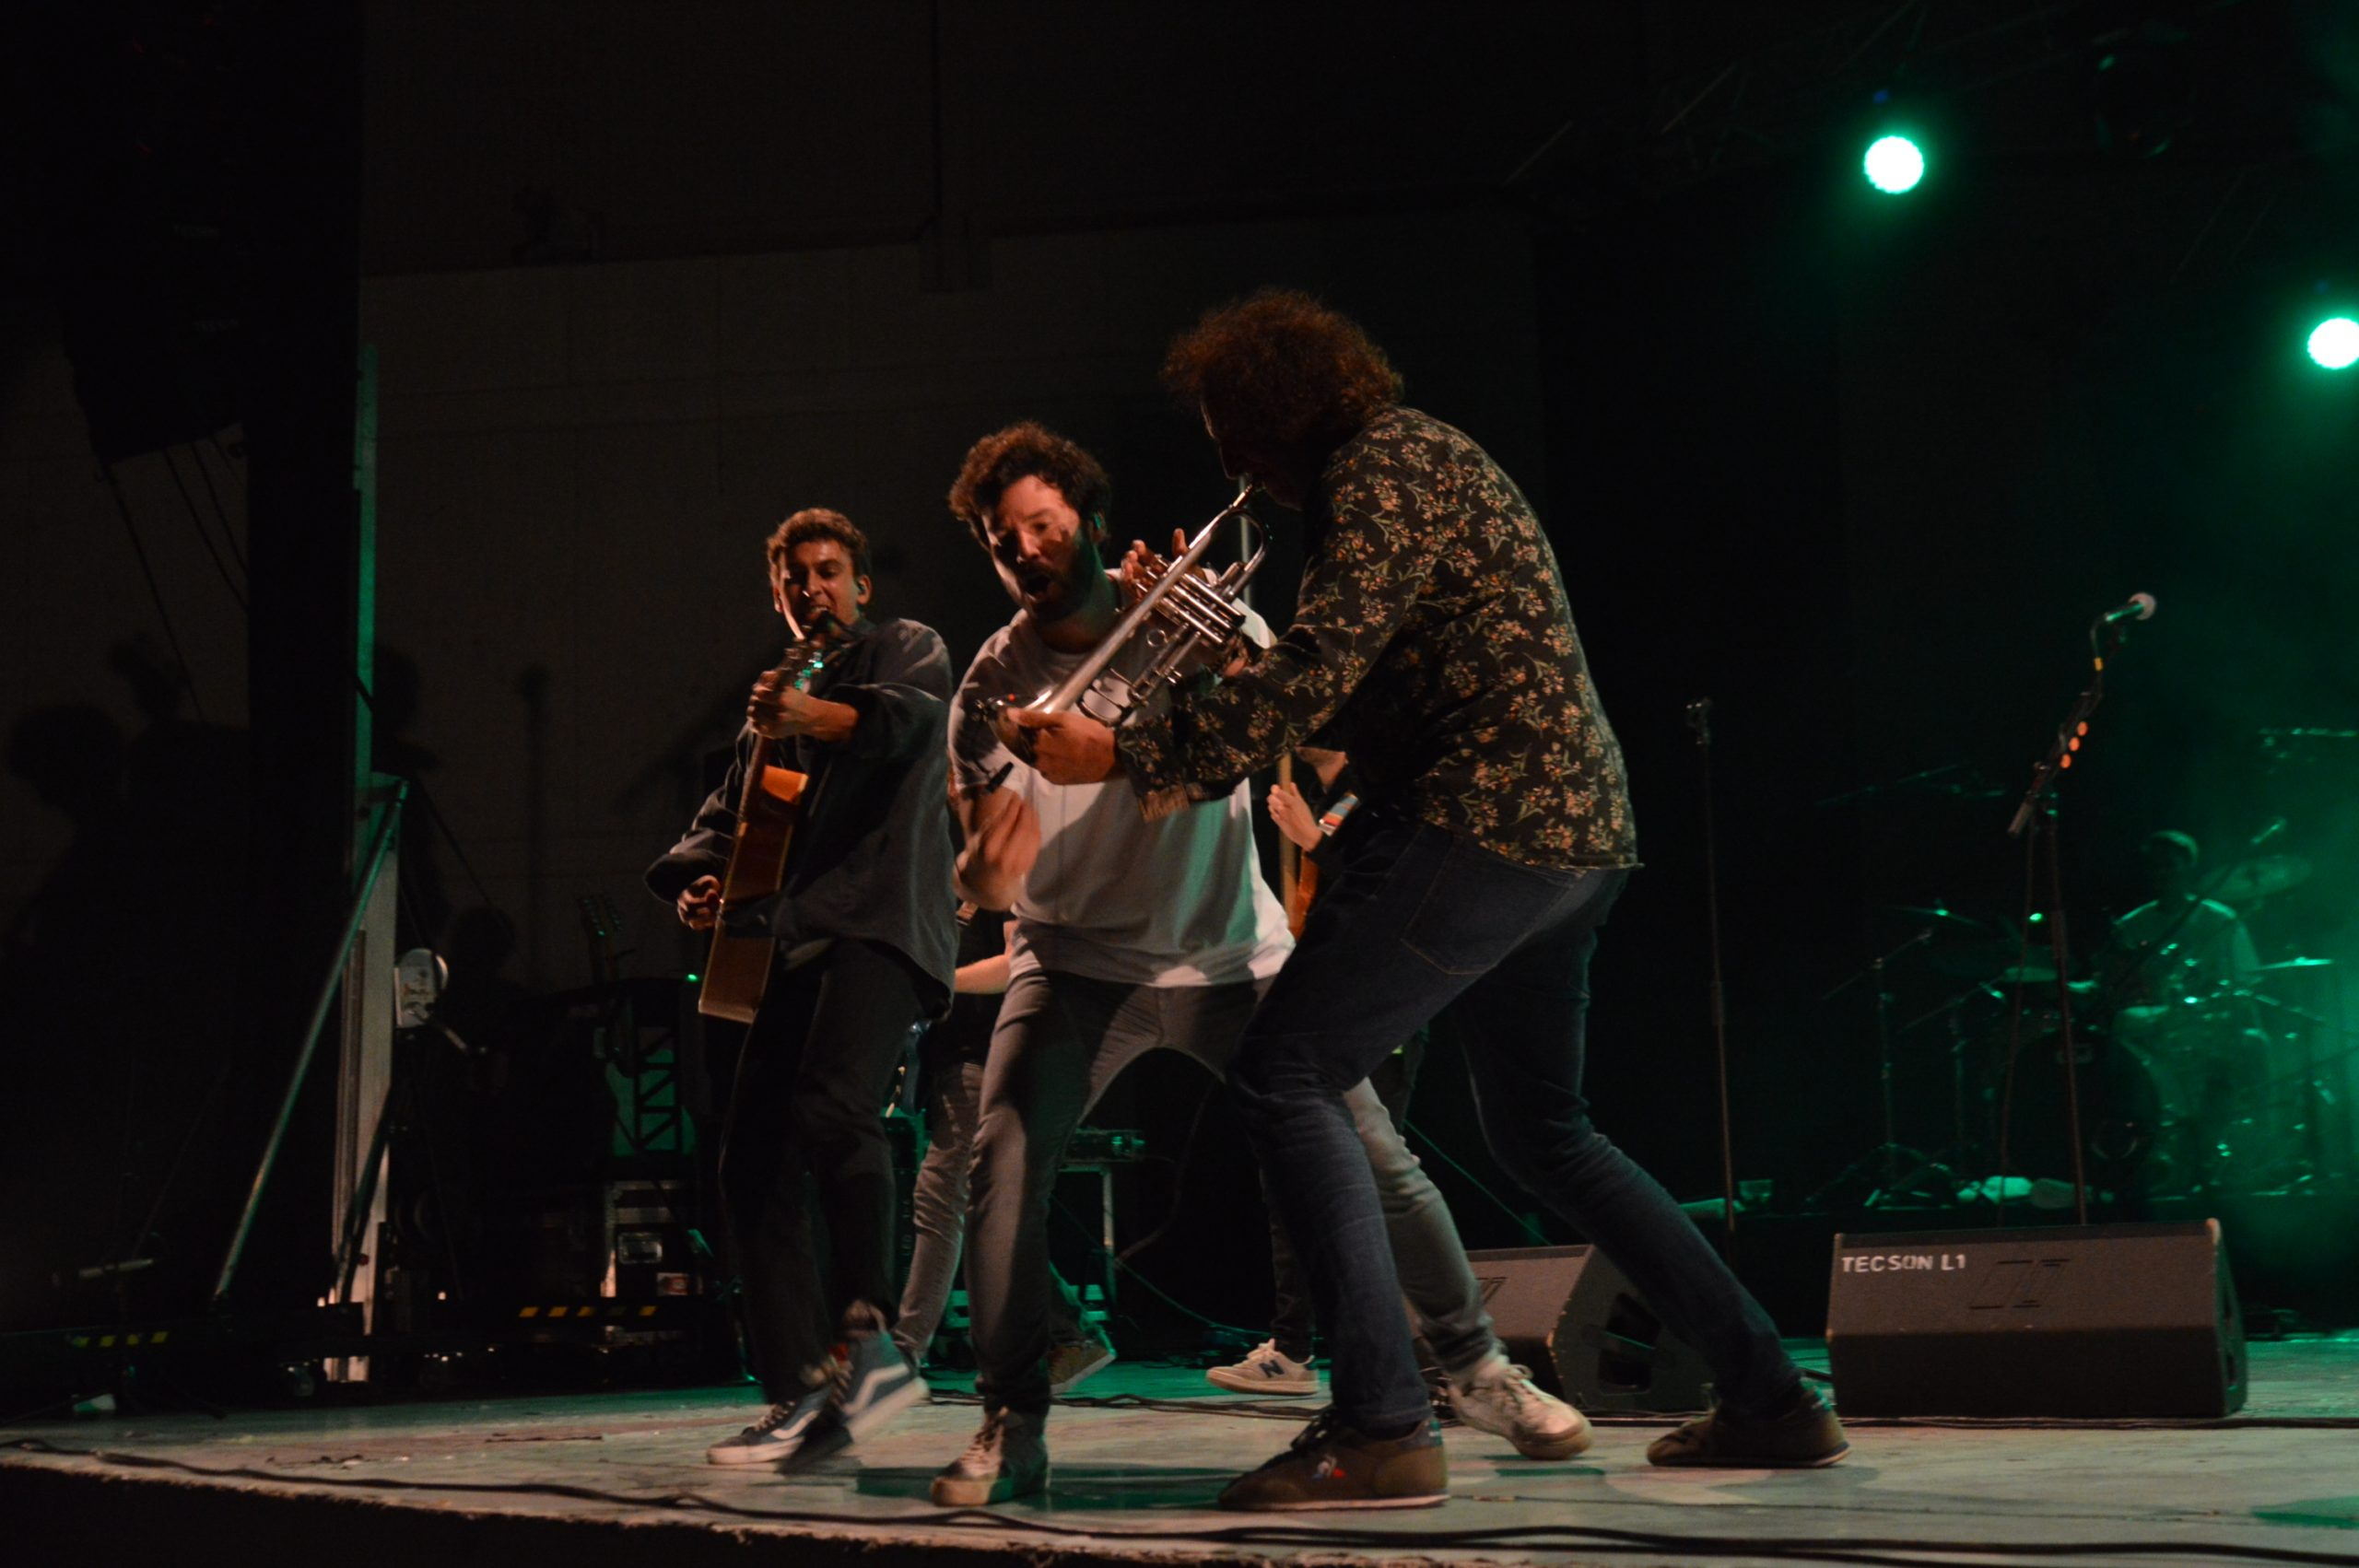 Taburete se entrega a su público en Ponferrada y dan la alternativa al ponferradino Pravlenha 28